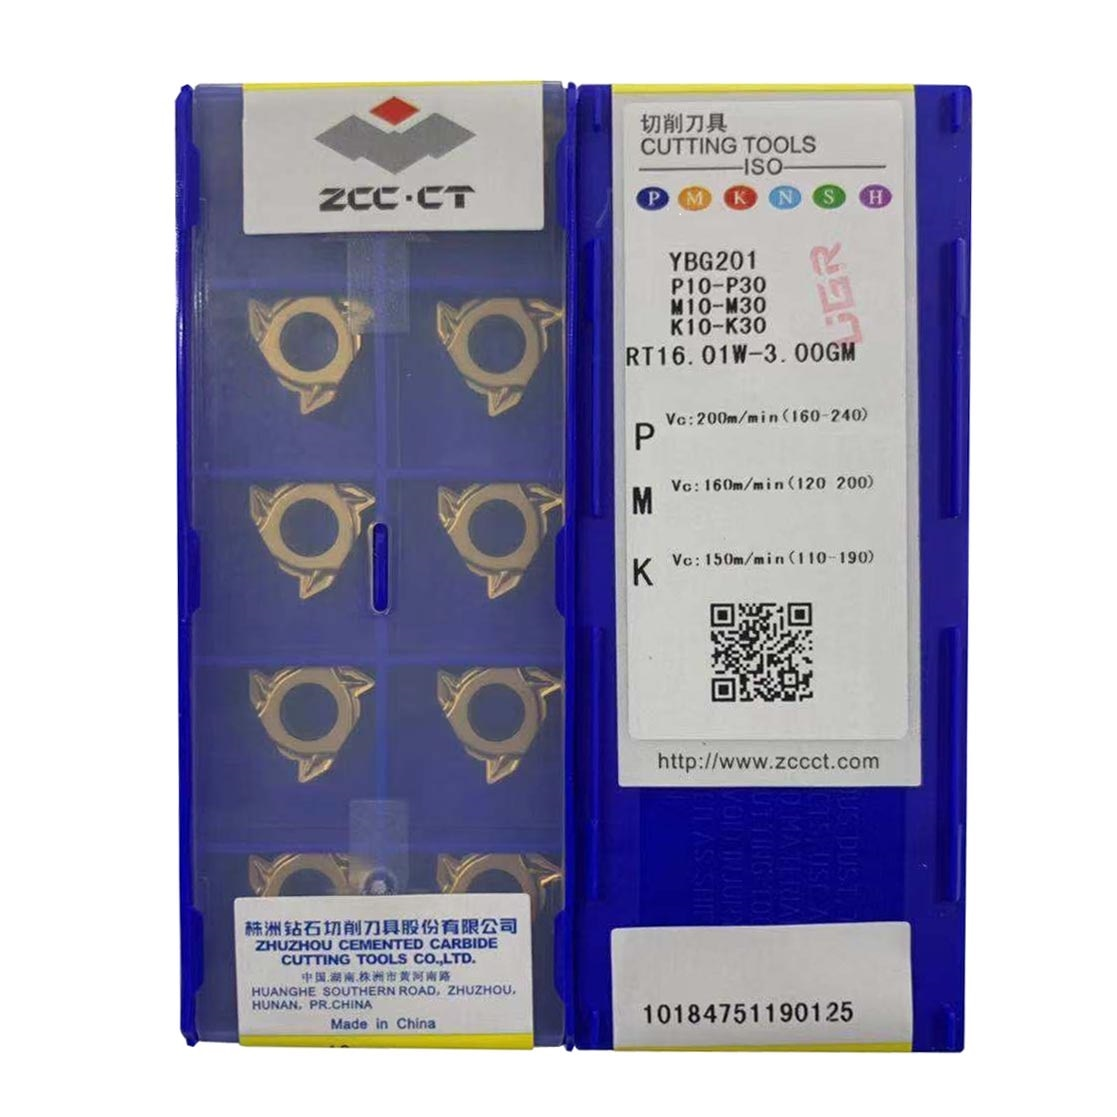 Inserto de rosca Original ZCC RT16.01W-3.0GM YBG201 inserto de rosca externa 3,0 iso para acero inoxidable hierro fundido RT16 CNC